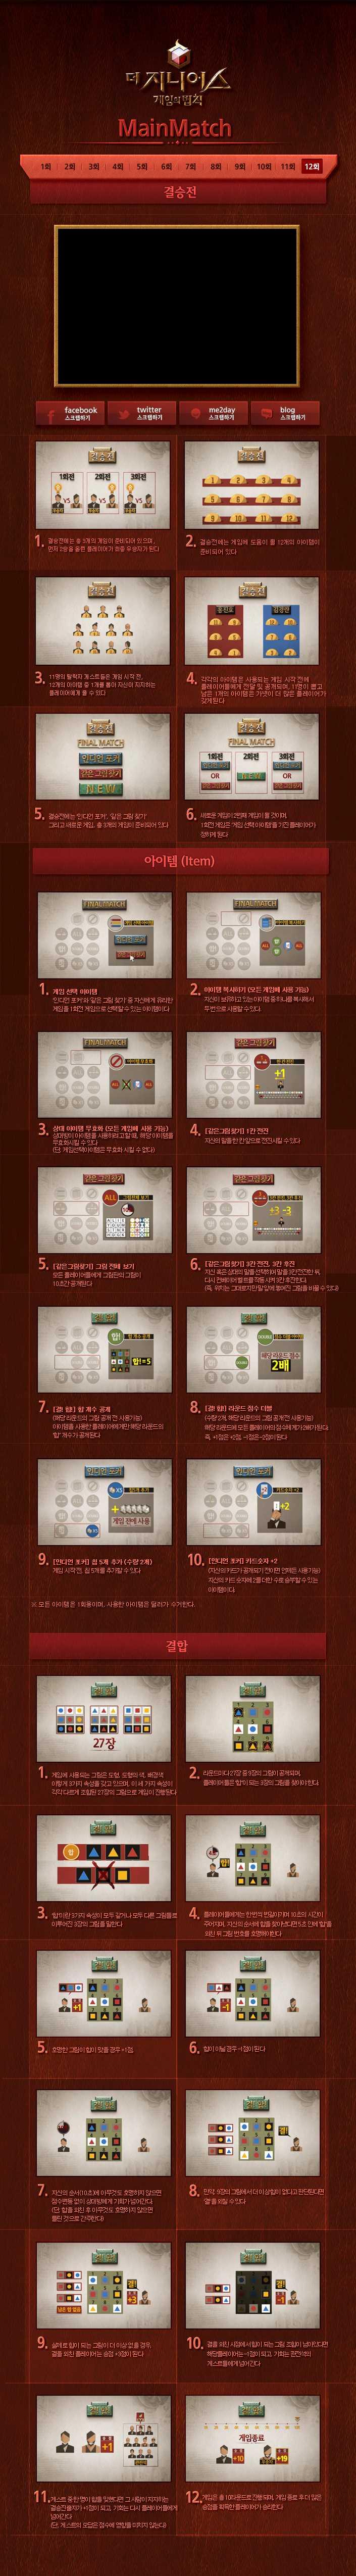 [tvN]더 지니어스:게임의 법칙 12회 메인매치 -결승전